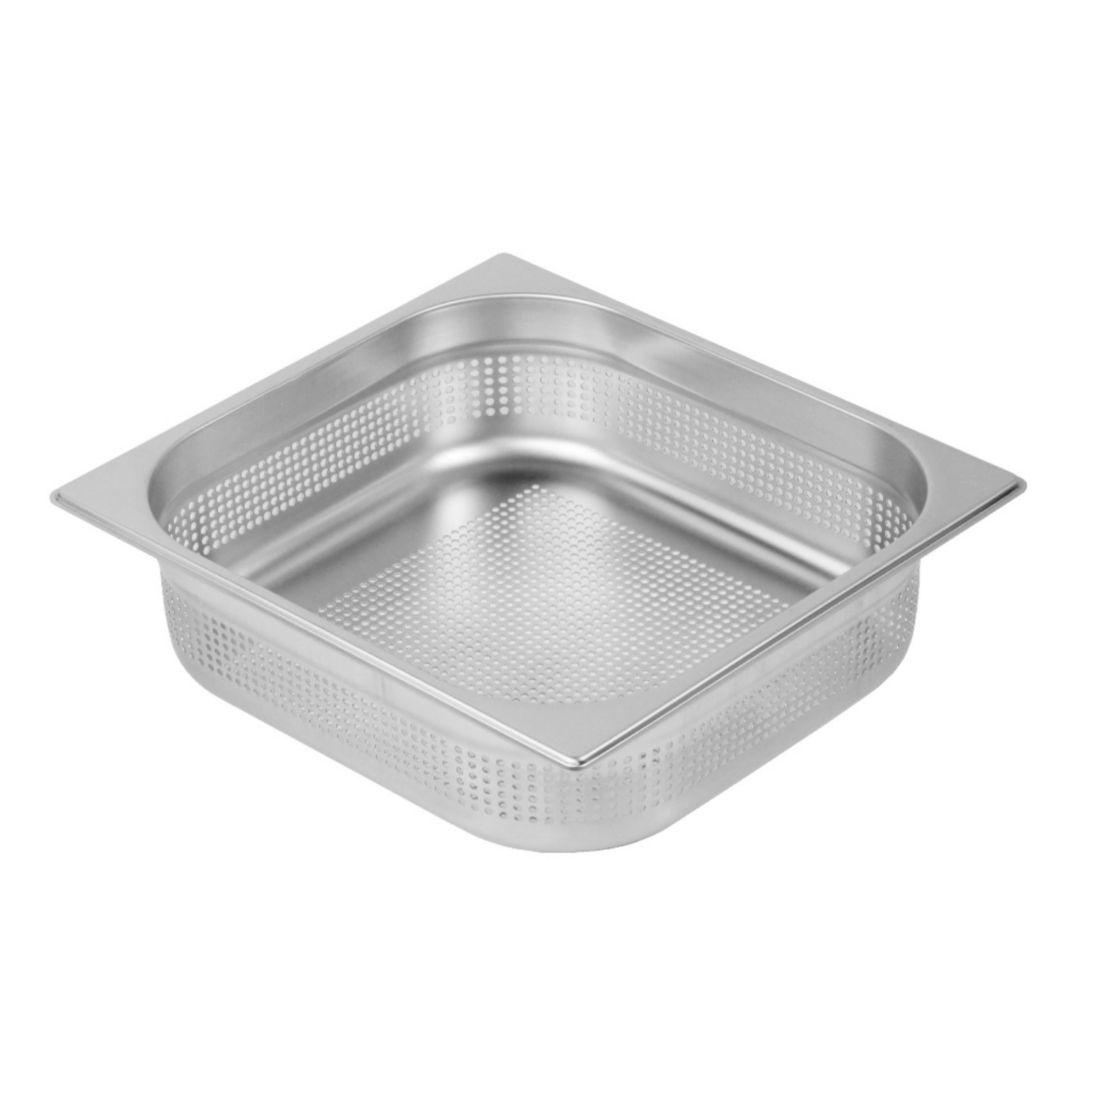 Gastronádoba Profi děrovaná GN 2/3 040 mm